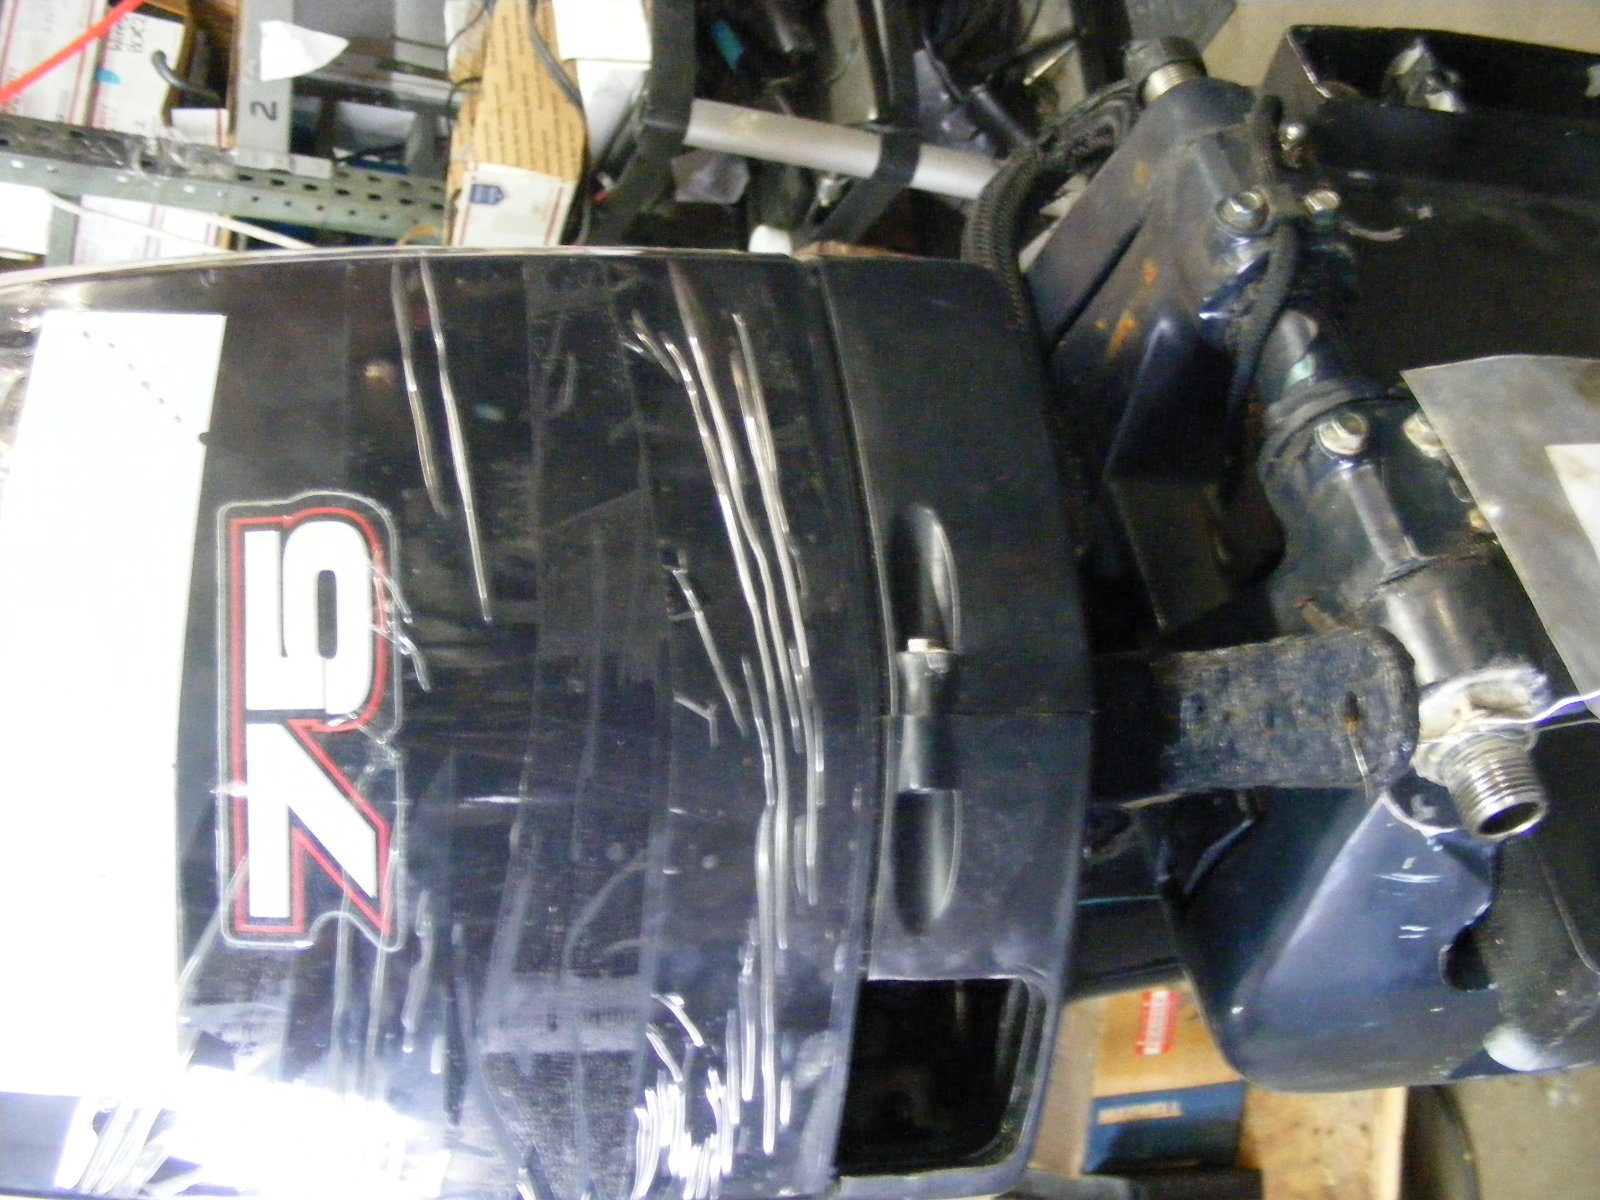 2005 Evinrude Johnson 75 Hp Shaft 20 Outboard Engine Motor